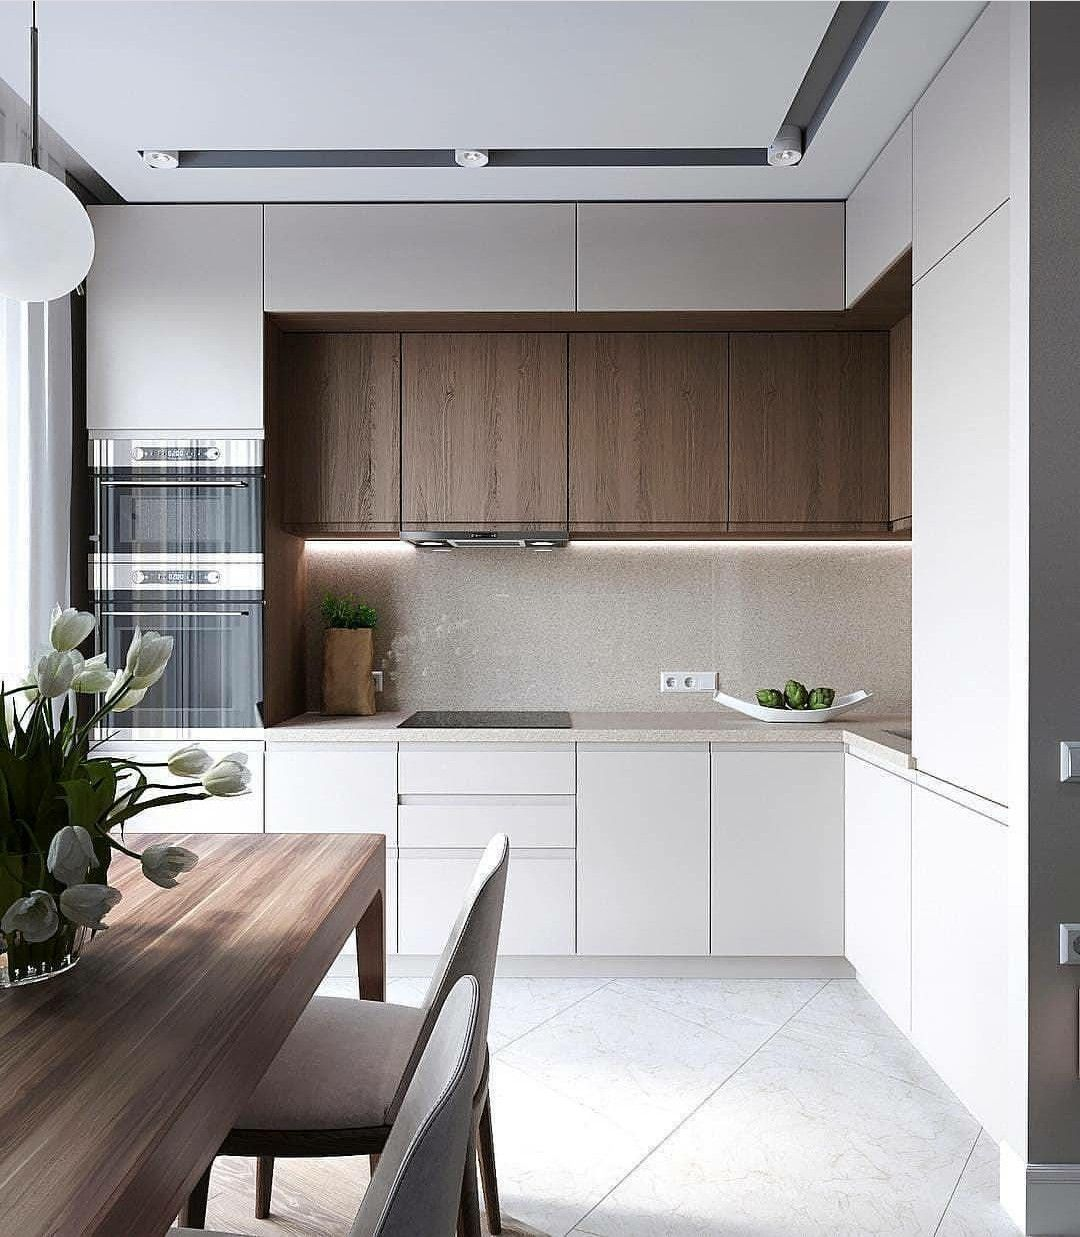 20+ Minimalist Kitchen Ideas Beautiful Simple and